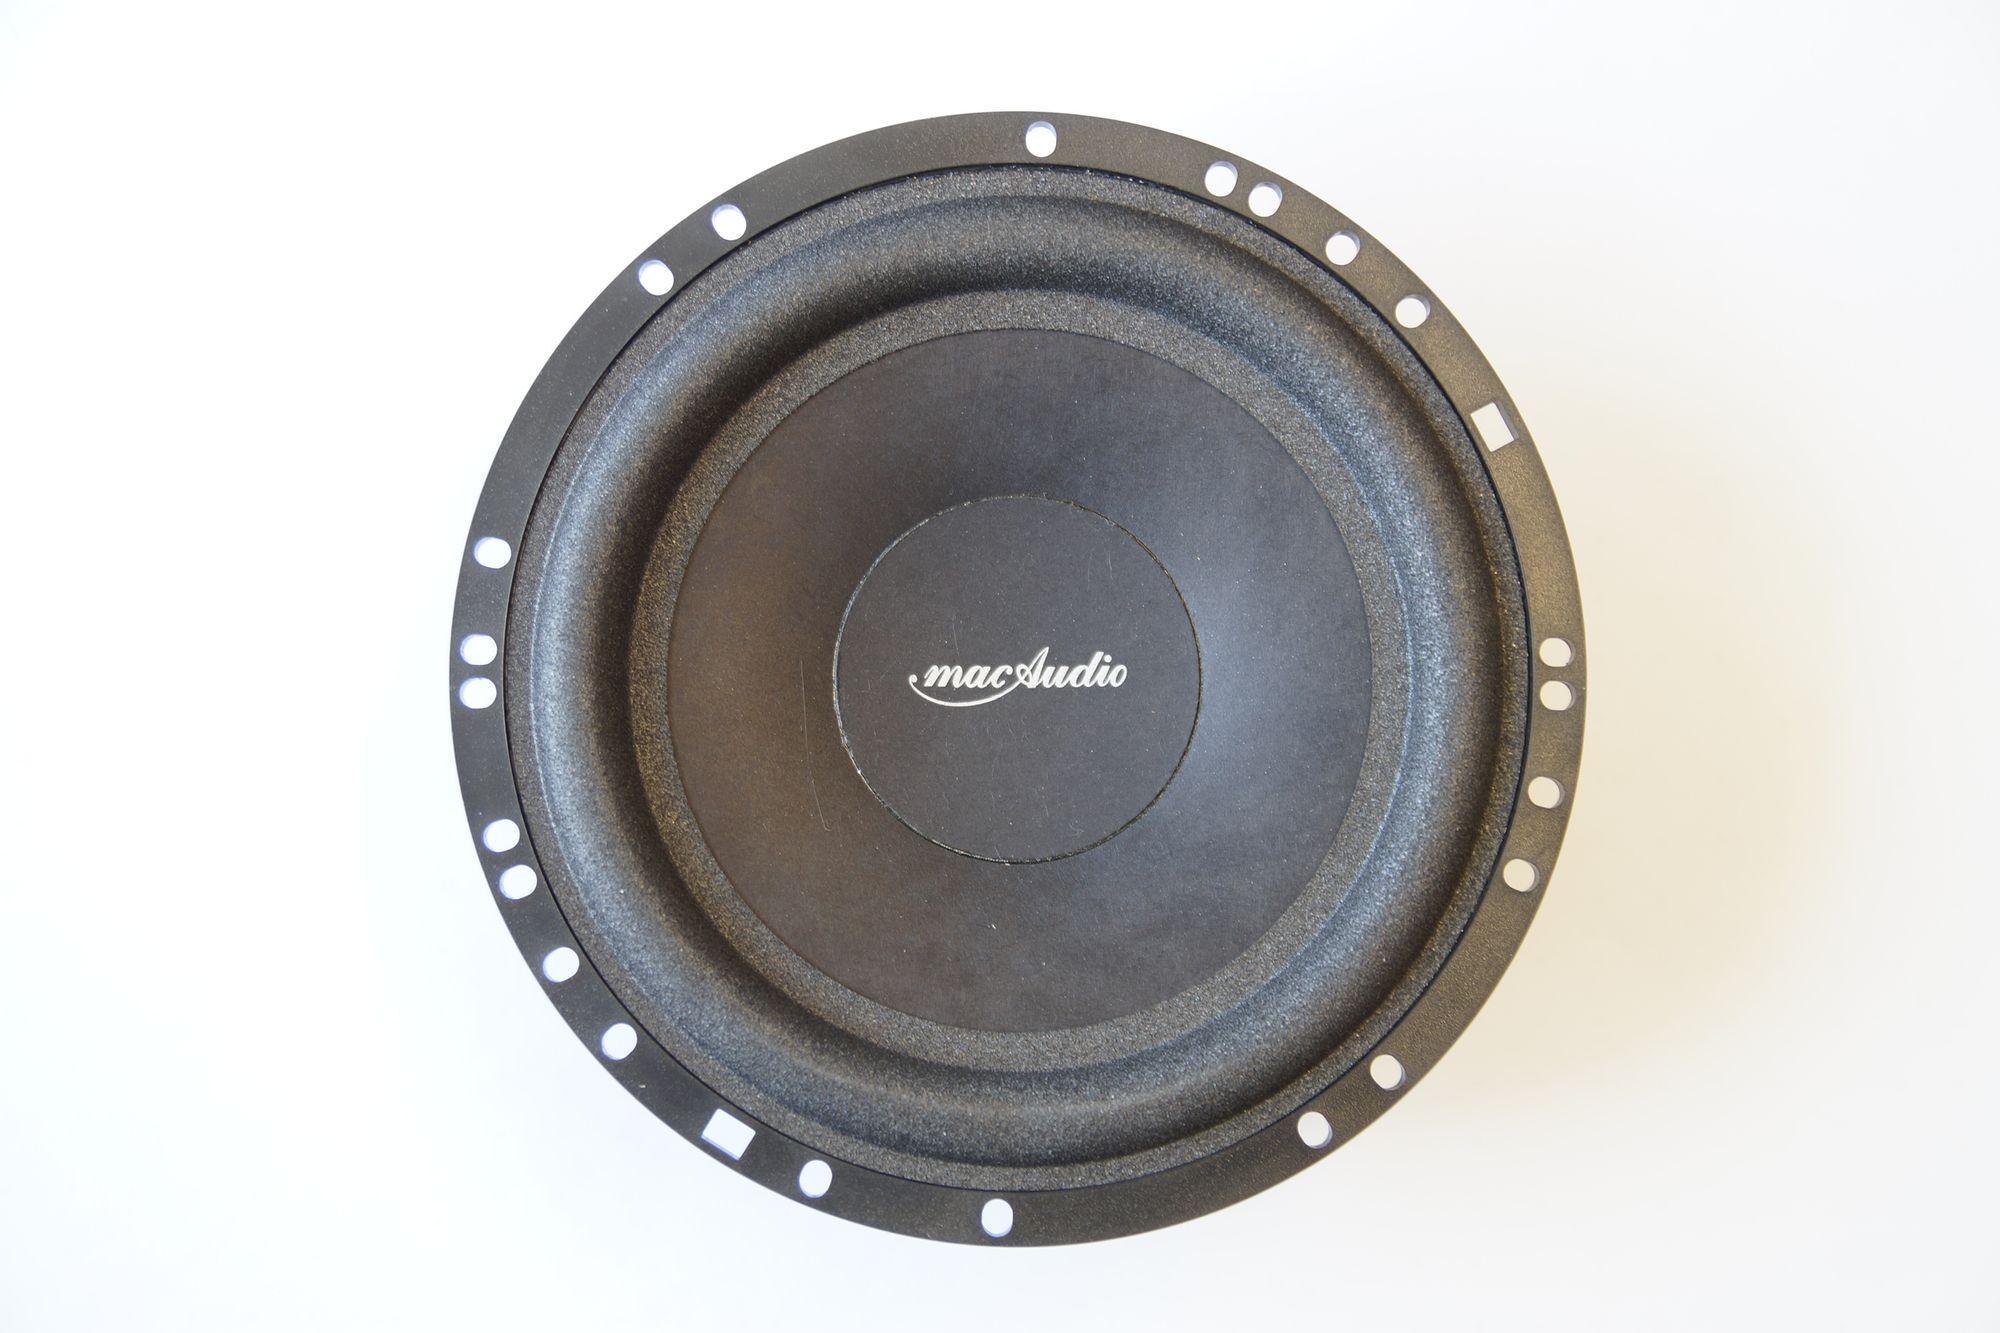 Mac Audio Reference 2.16 Tieftöner 16 cm Basslautsprecher 1 Paar Neu 001